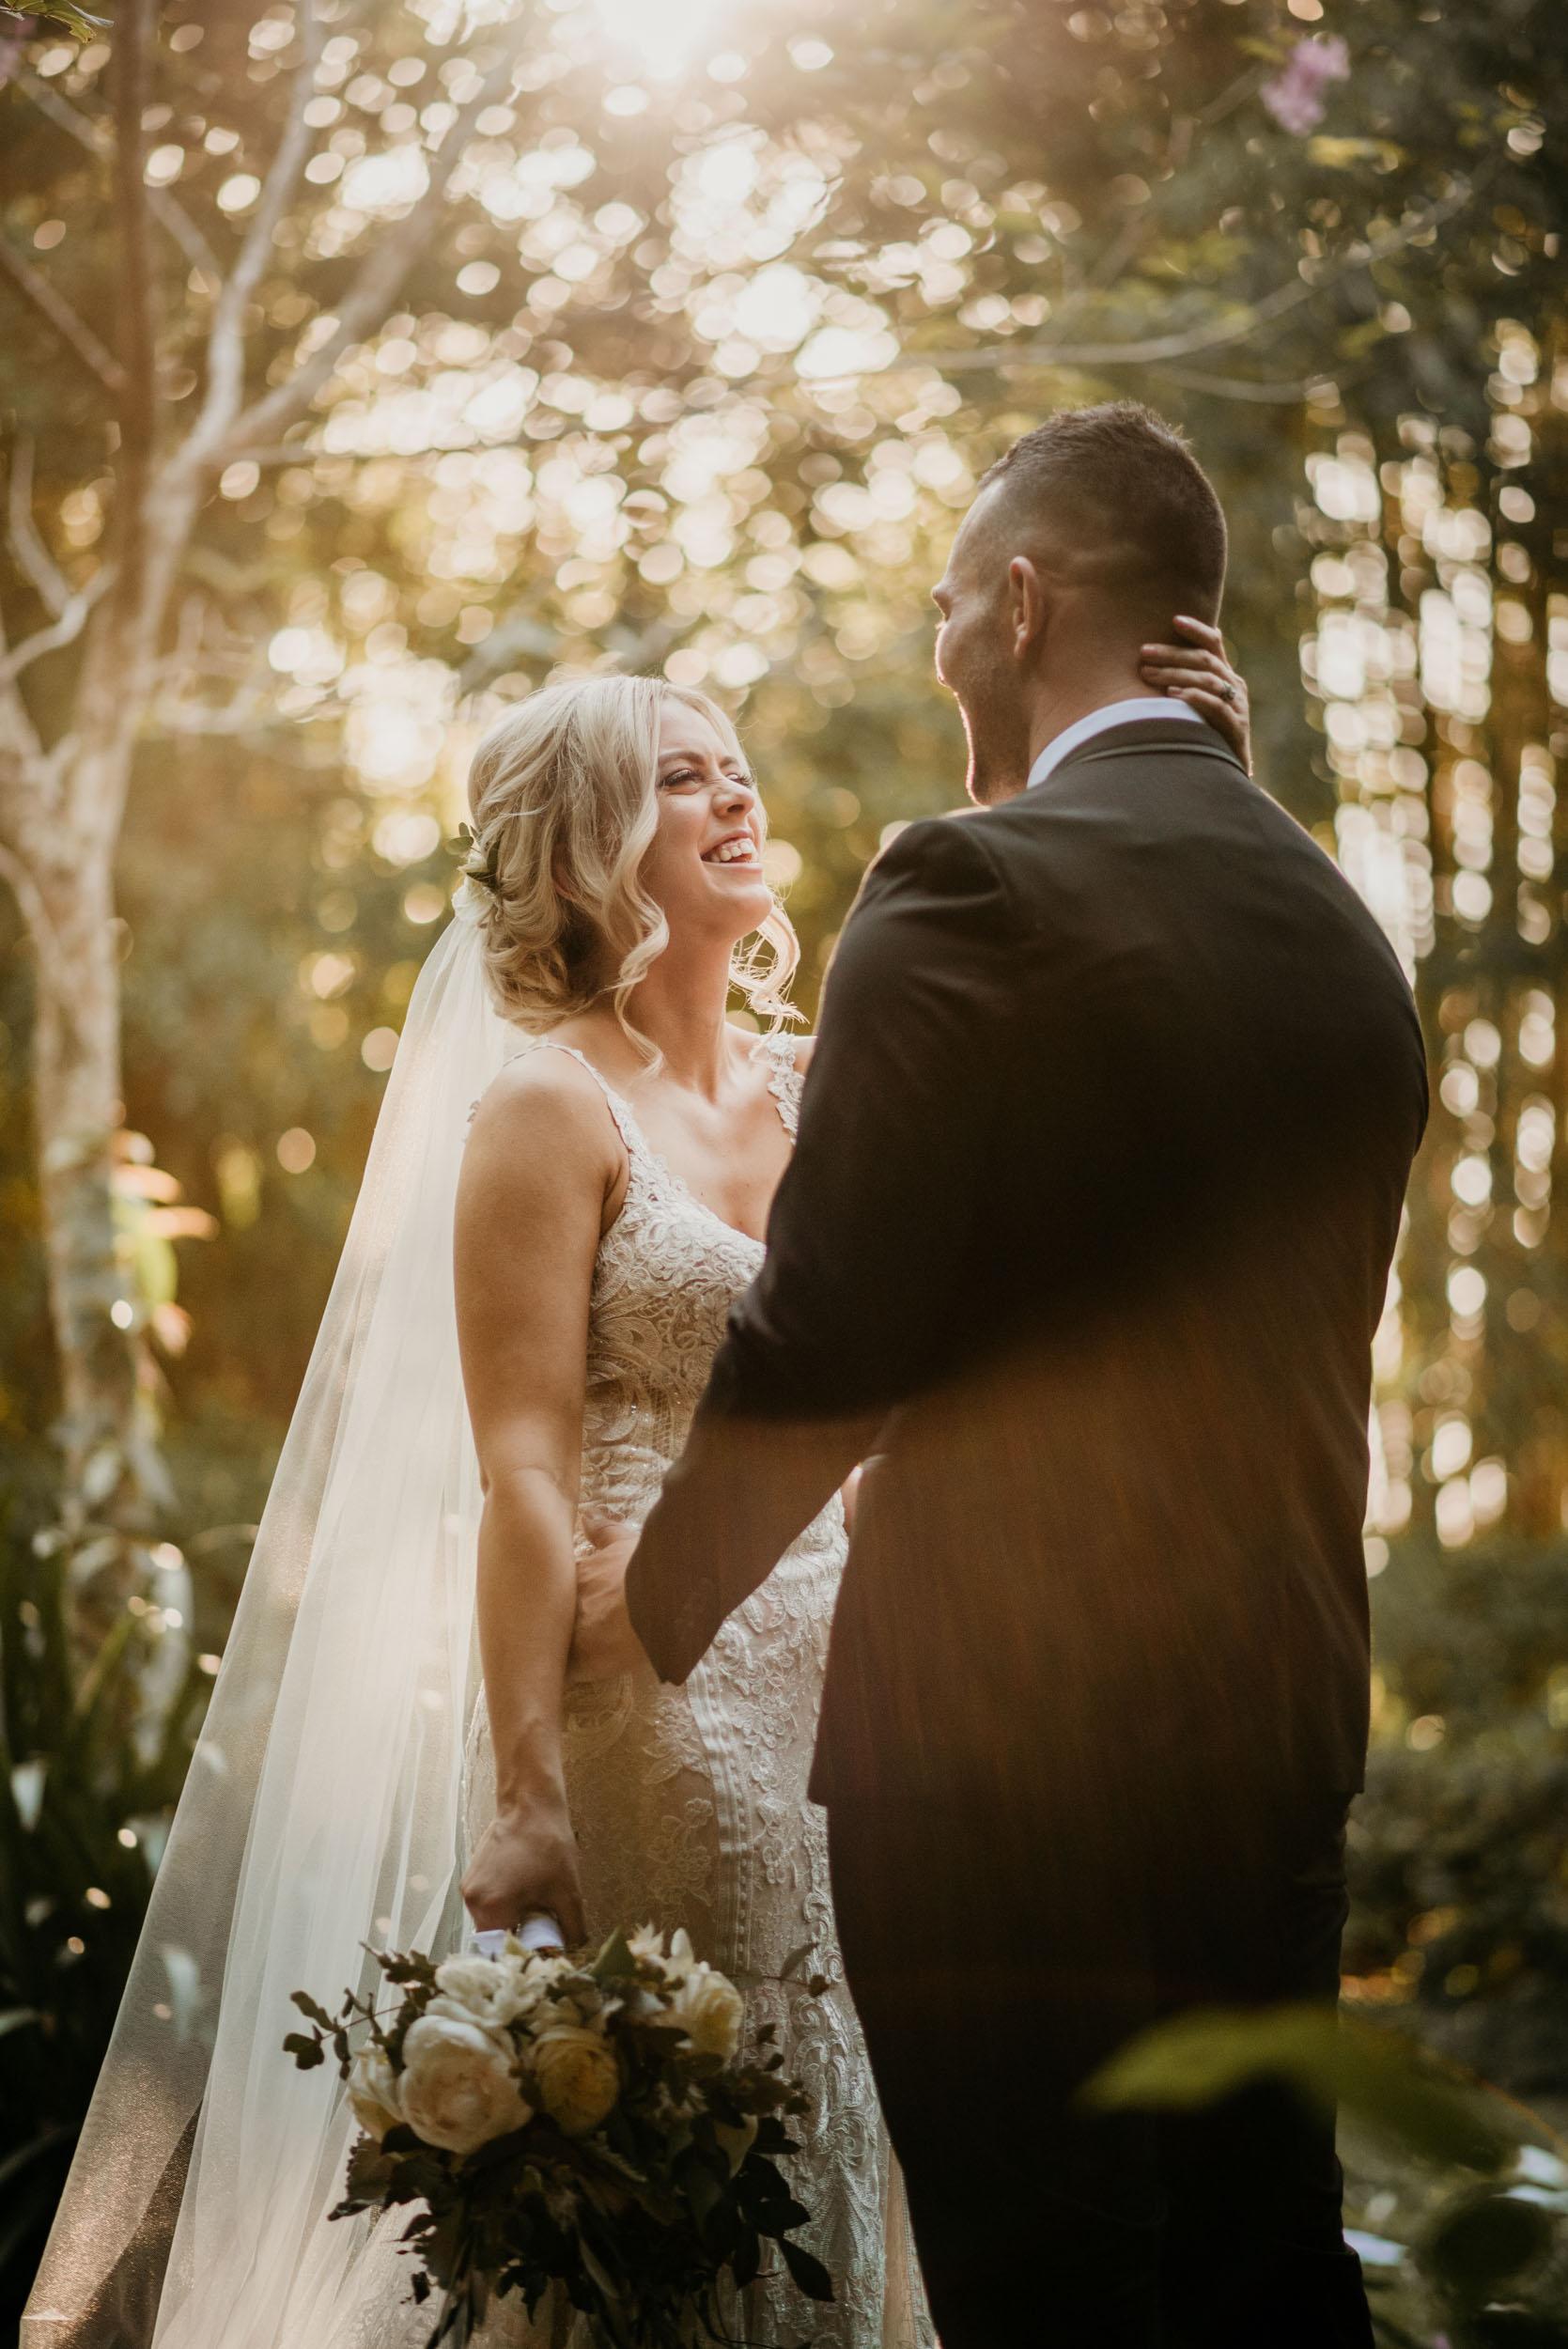 The Raw Photographer - Cairns and Port Douglas Wedding Photographer - Best of 2018-29.jpg